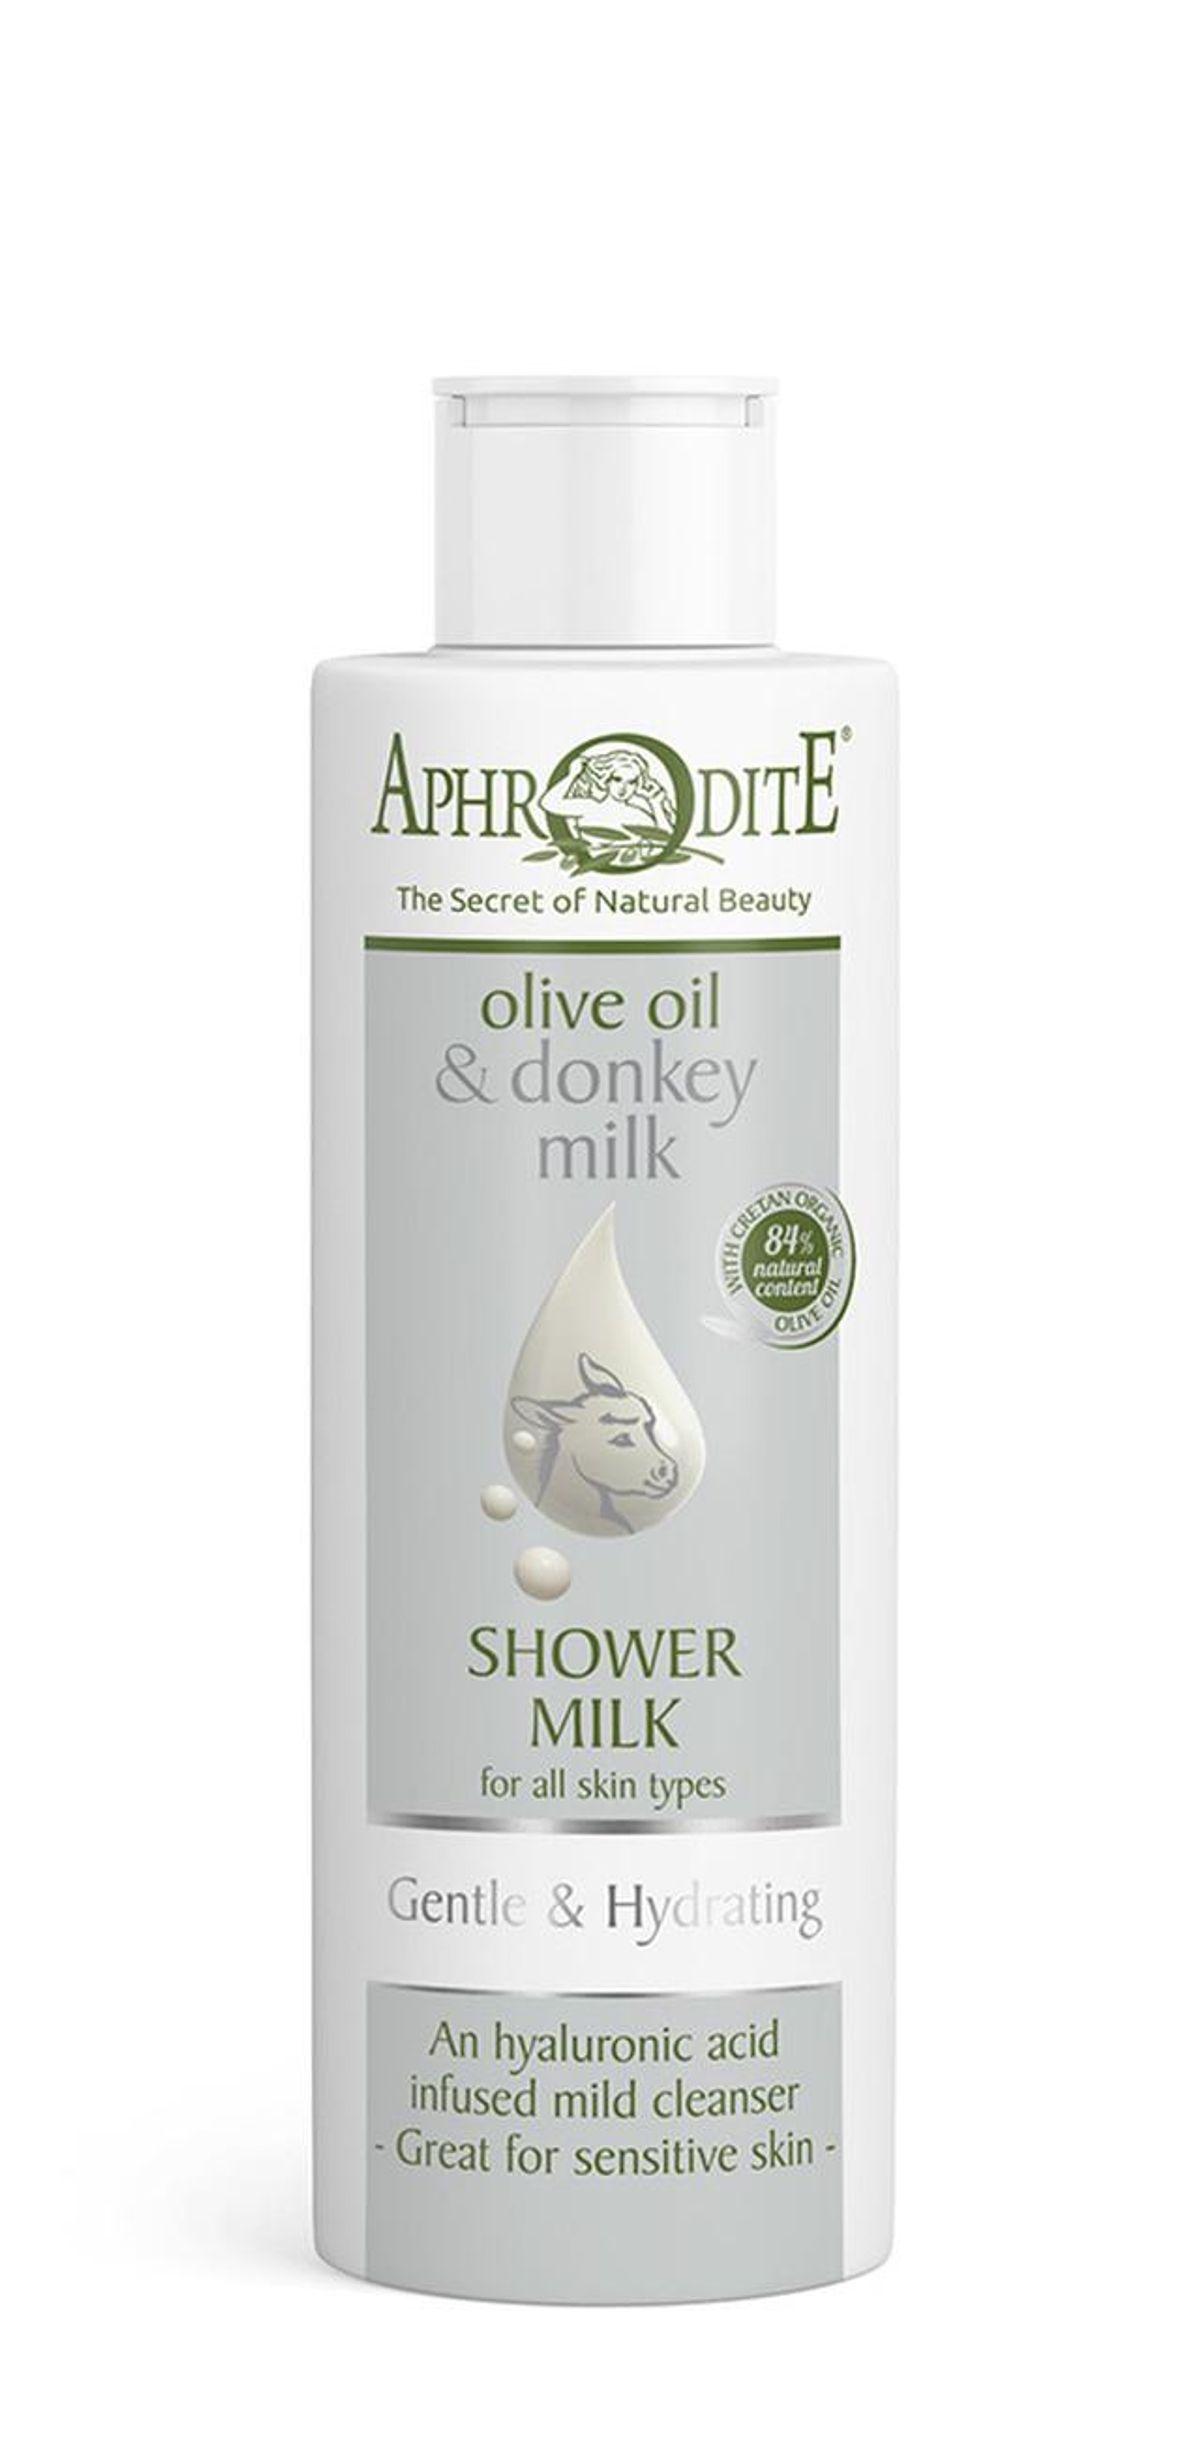 Aphrodite Gentle & Hydrating Shower Milk